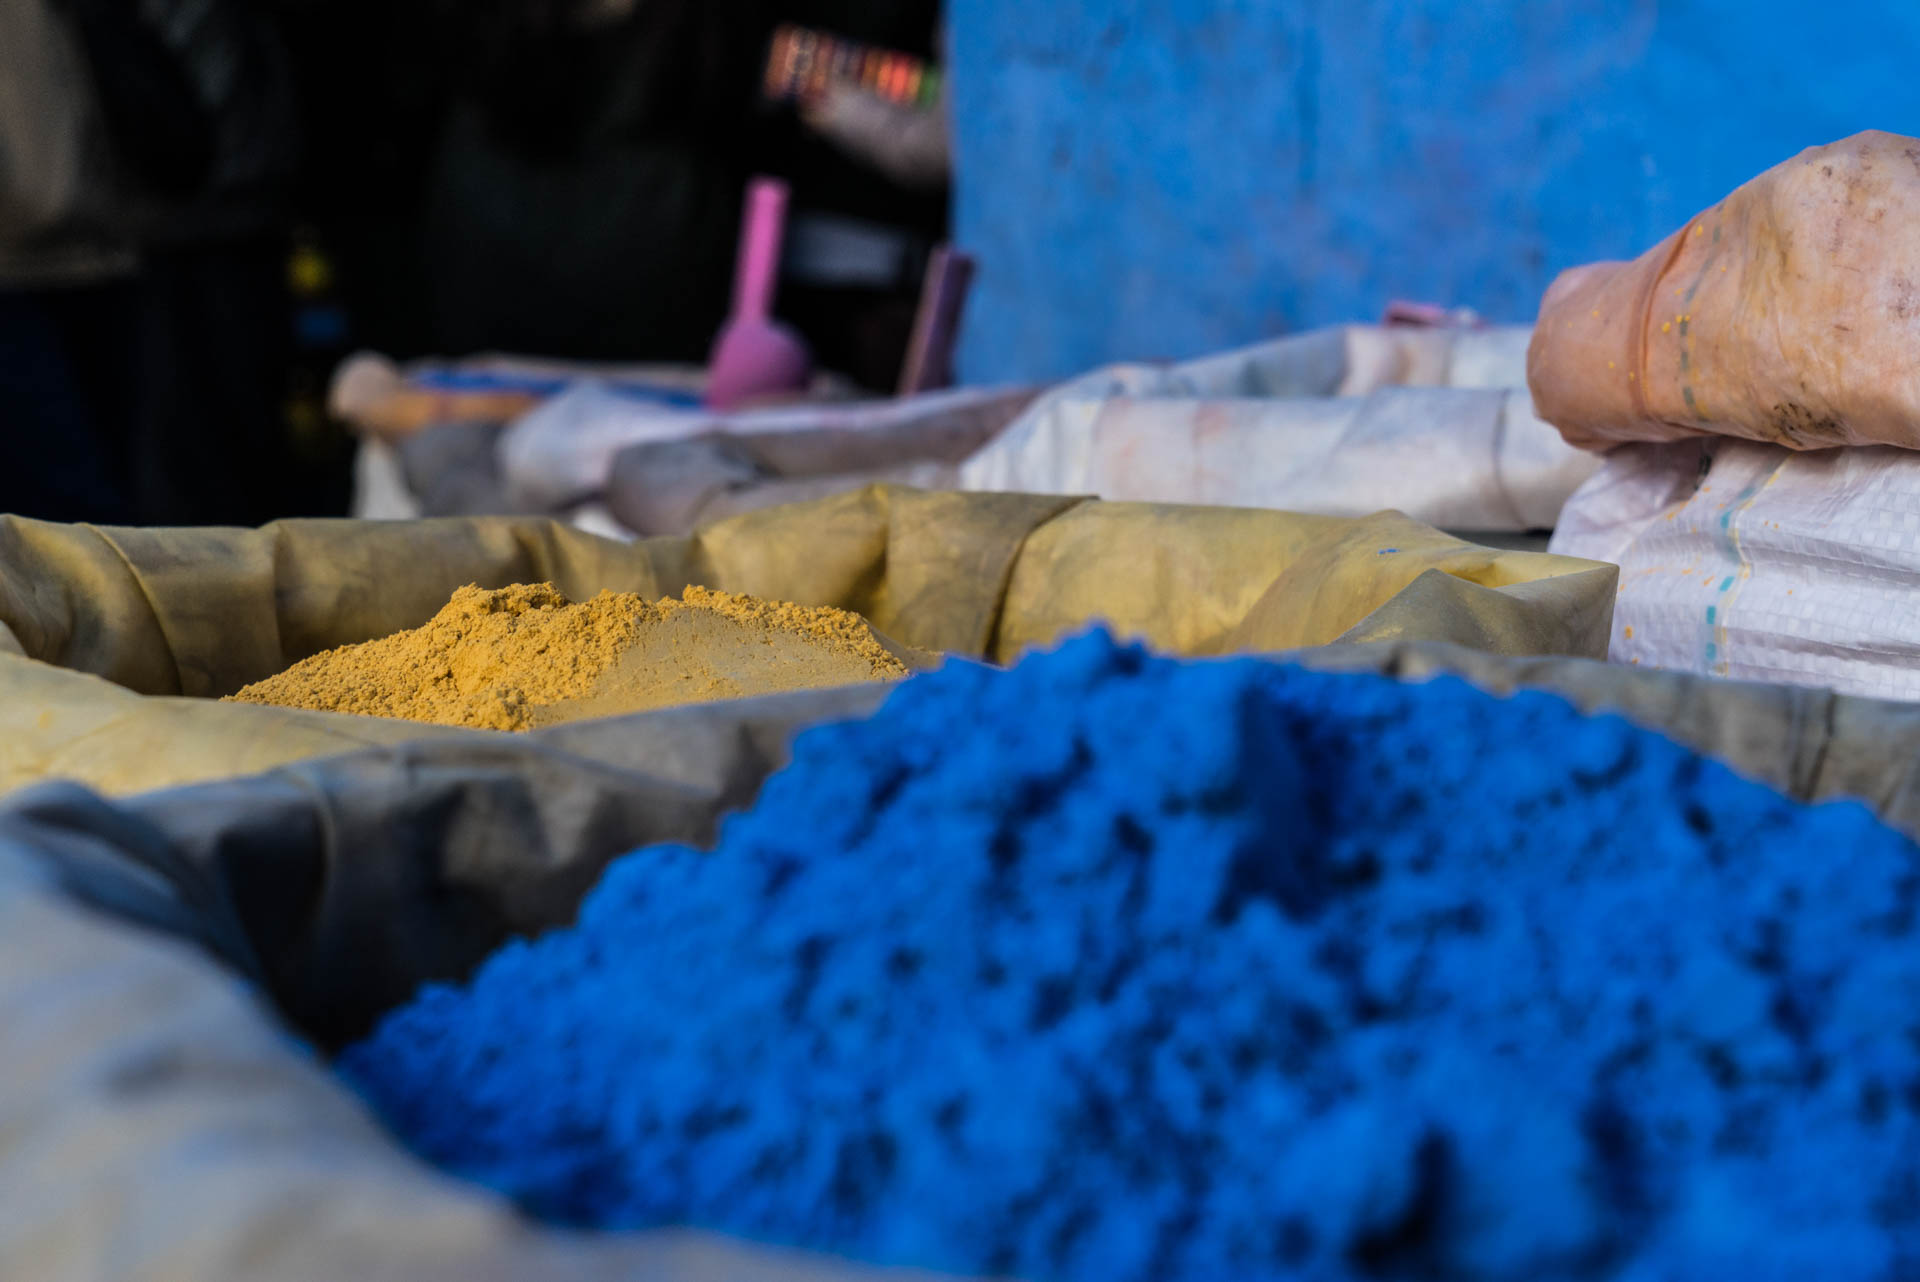 Morocco Chefchaouen blue powder, morocco, chefchaouen, , pescart, photo blog, travel blog, blog, photo travel blog, enrico pescantini, pescantini